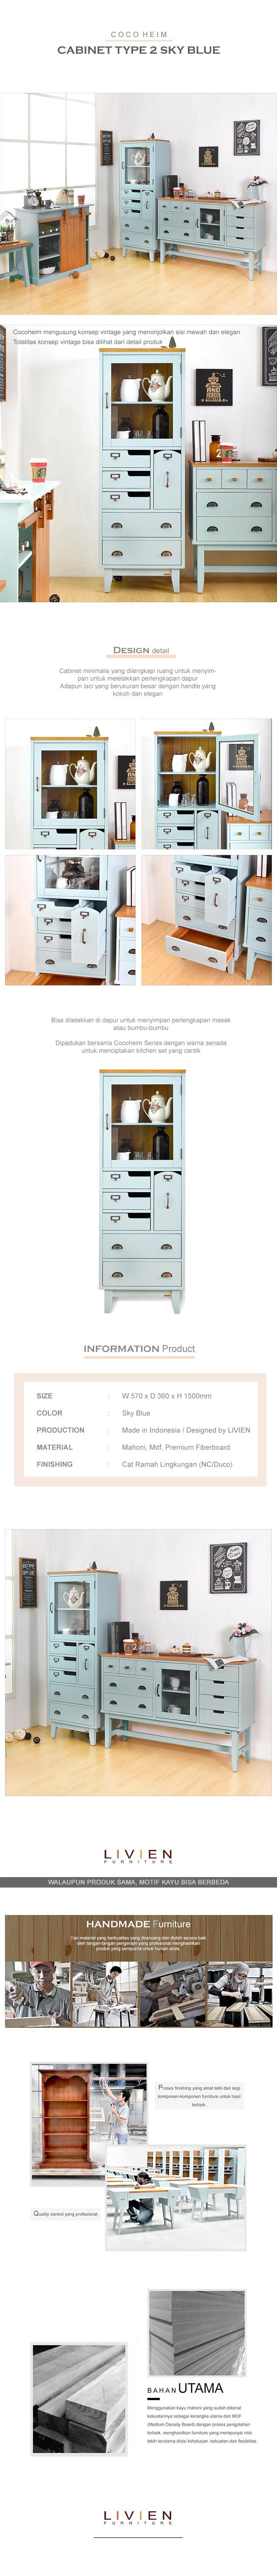 Coco Heim Cabinet